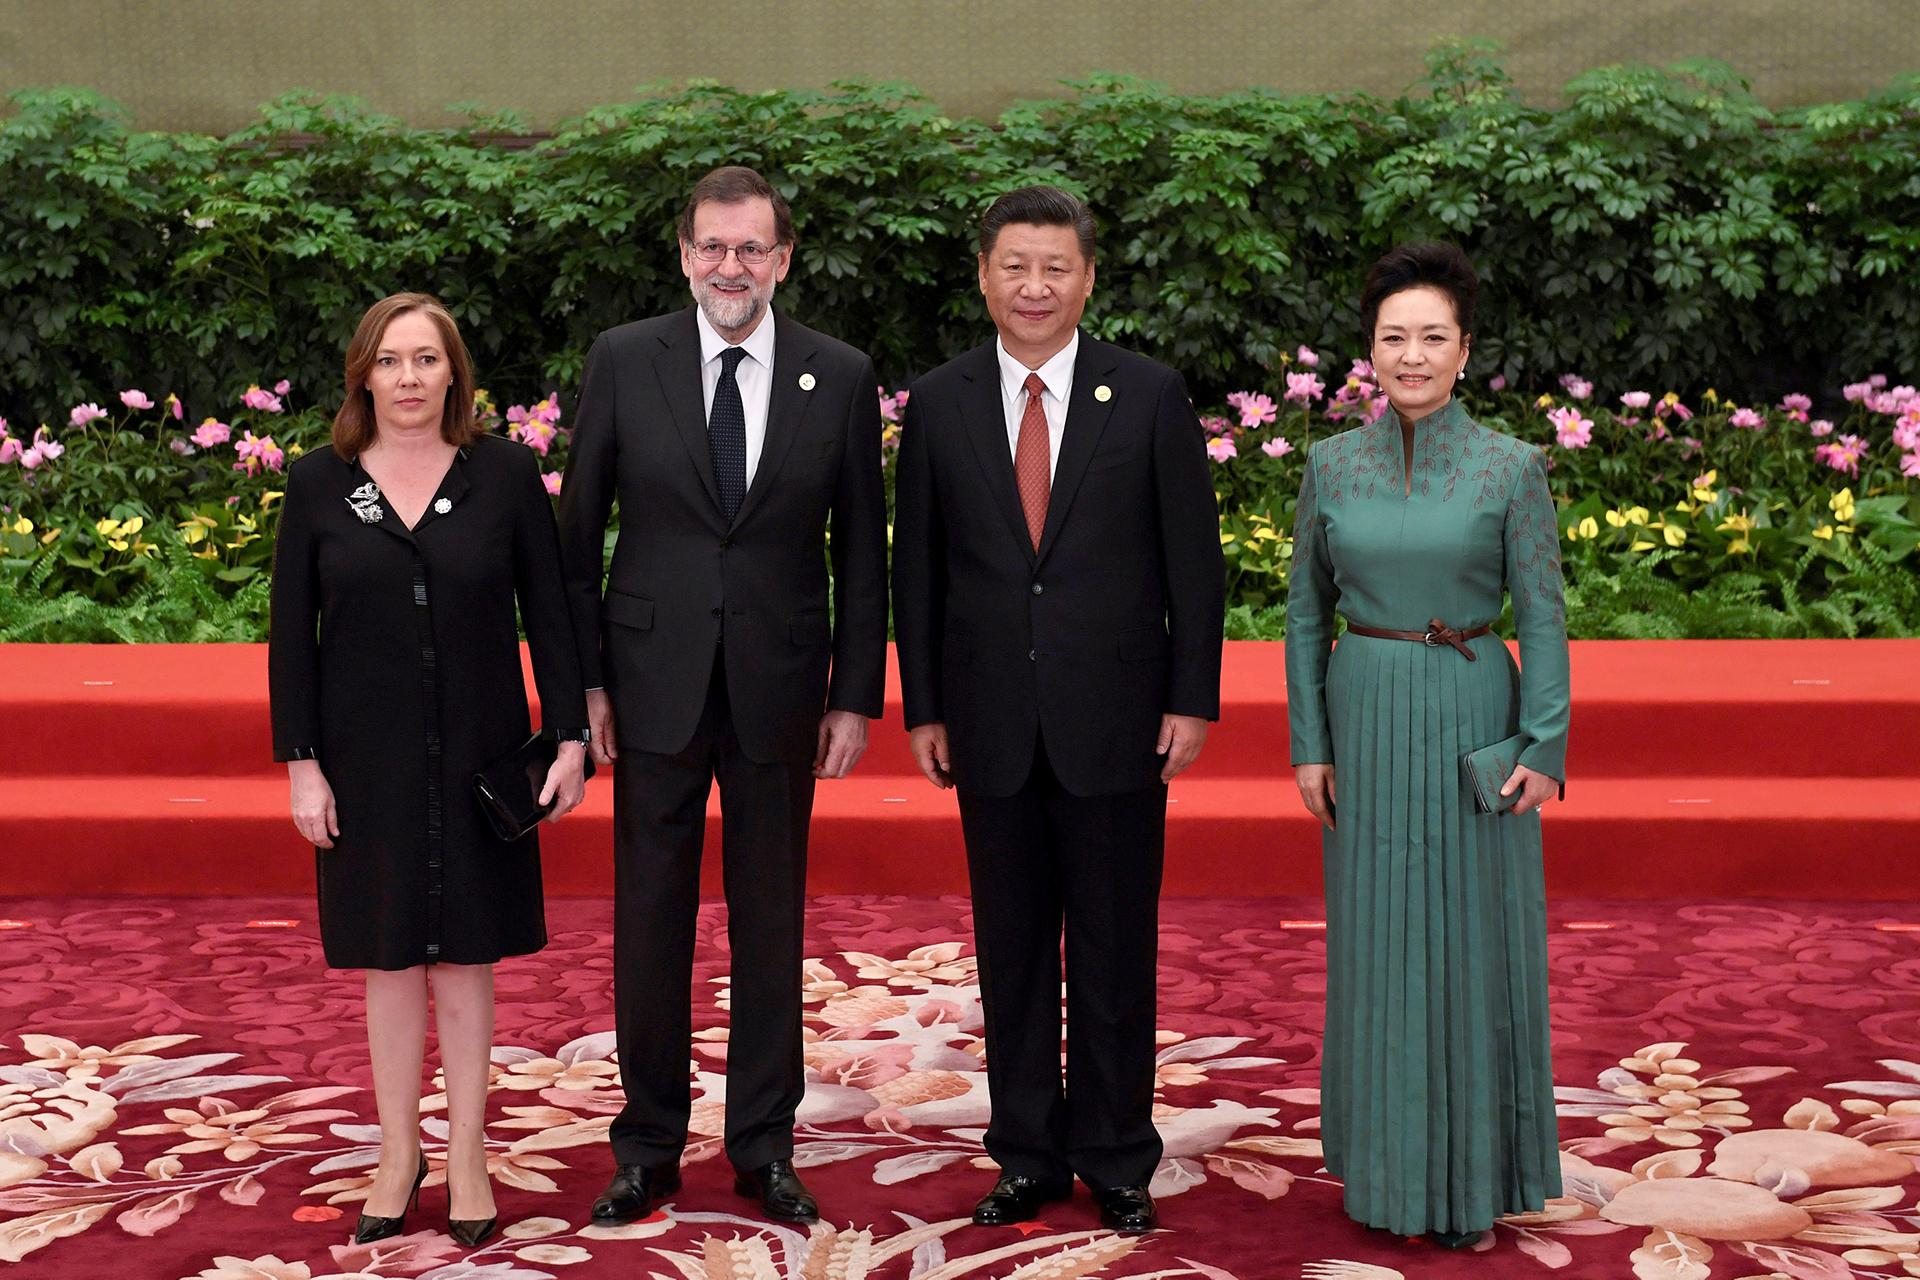 El primer ministro español Minister Mariano Rajoy y su esposa Elvira Fernandez Balboa junto a la pareja china